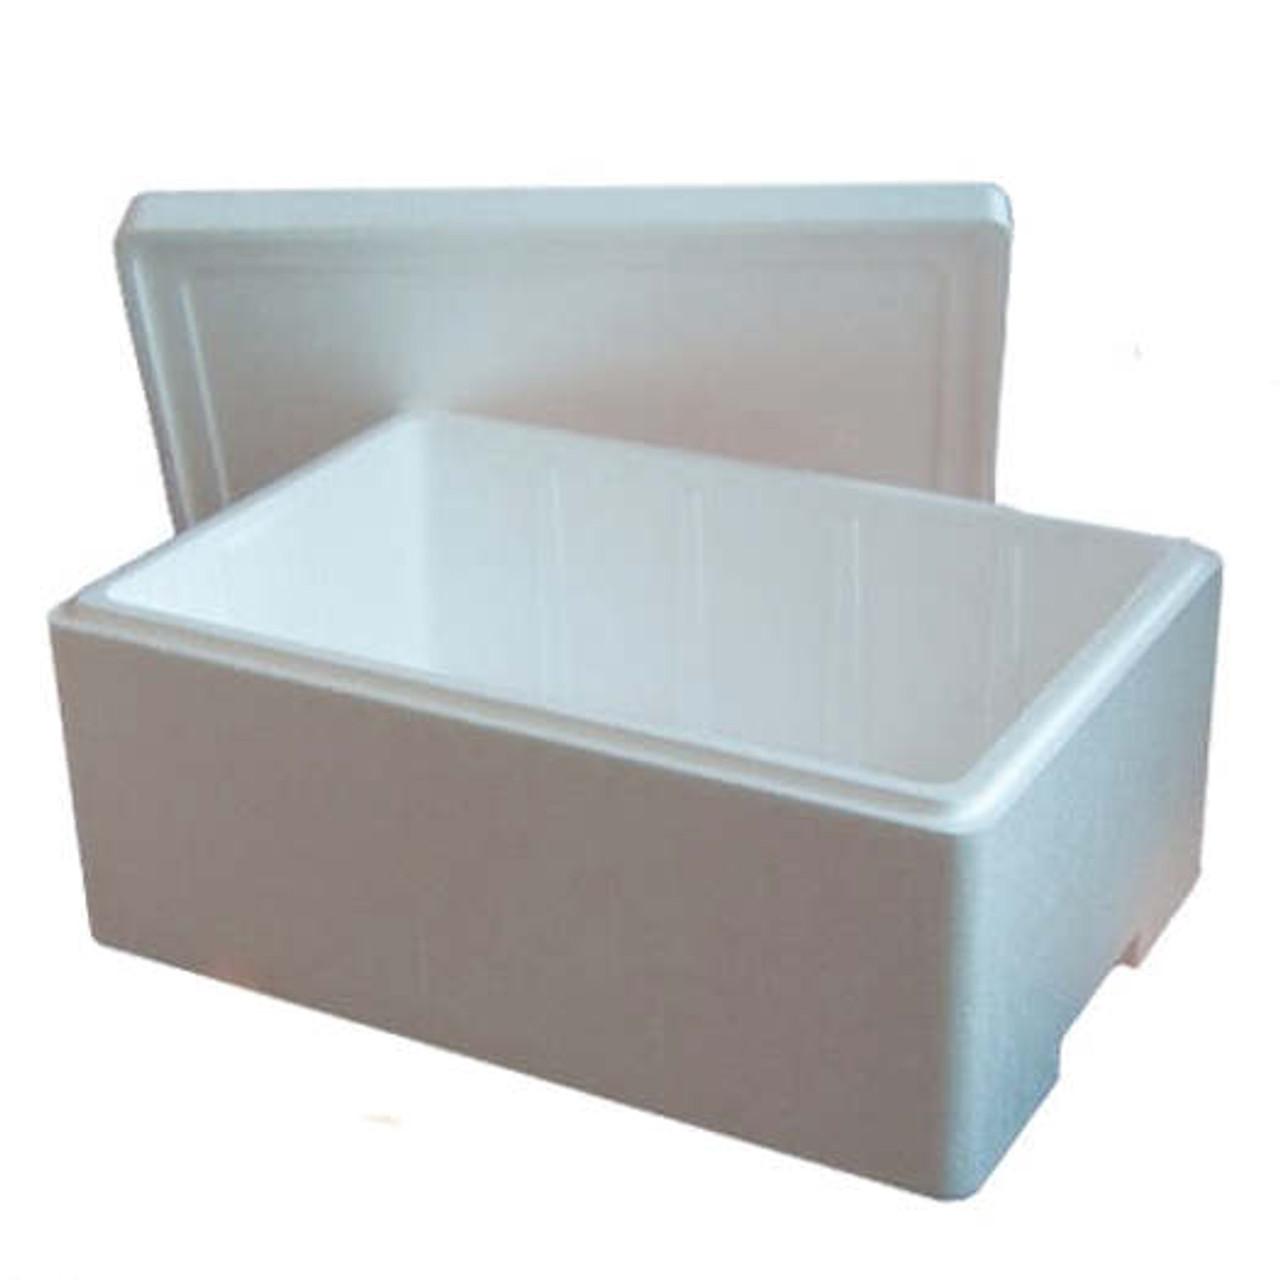 20klo 585 x 365 x 240mm Polystyrene box & lid ( min 40 boxes )